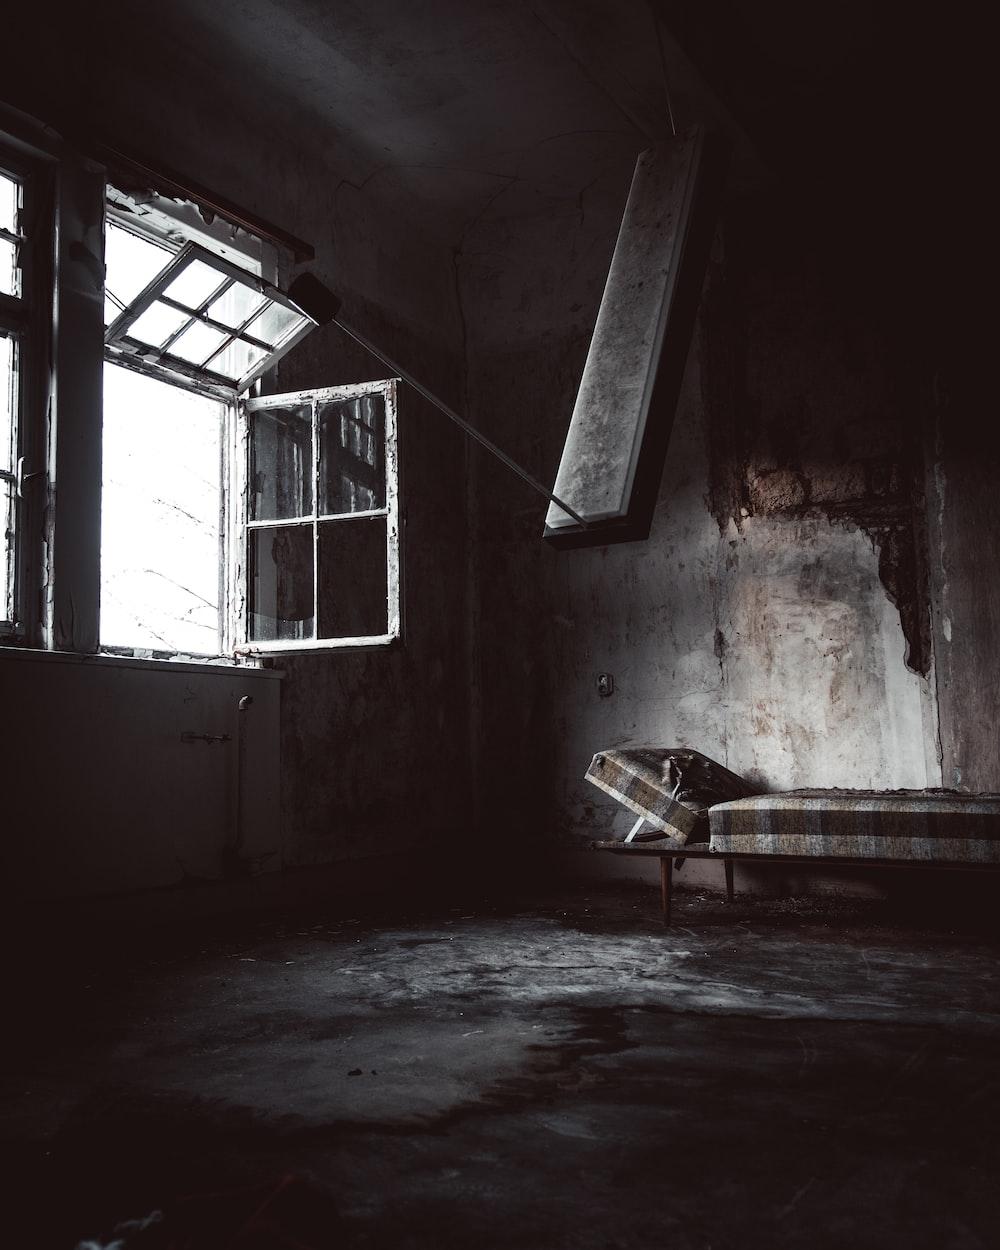 bed inside abandoned building near opened window